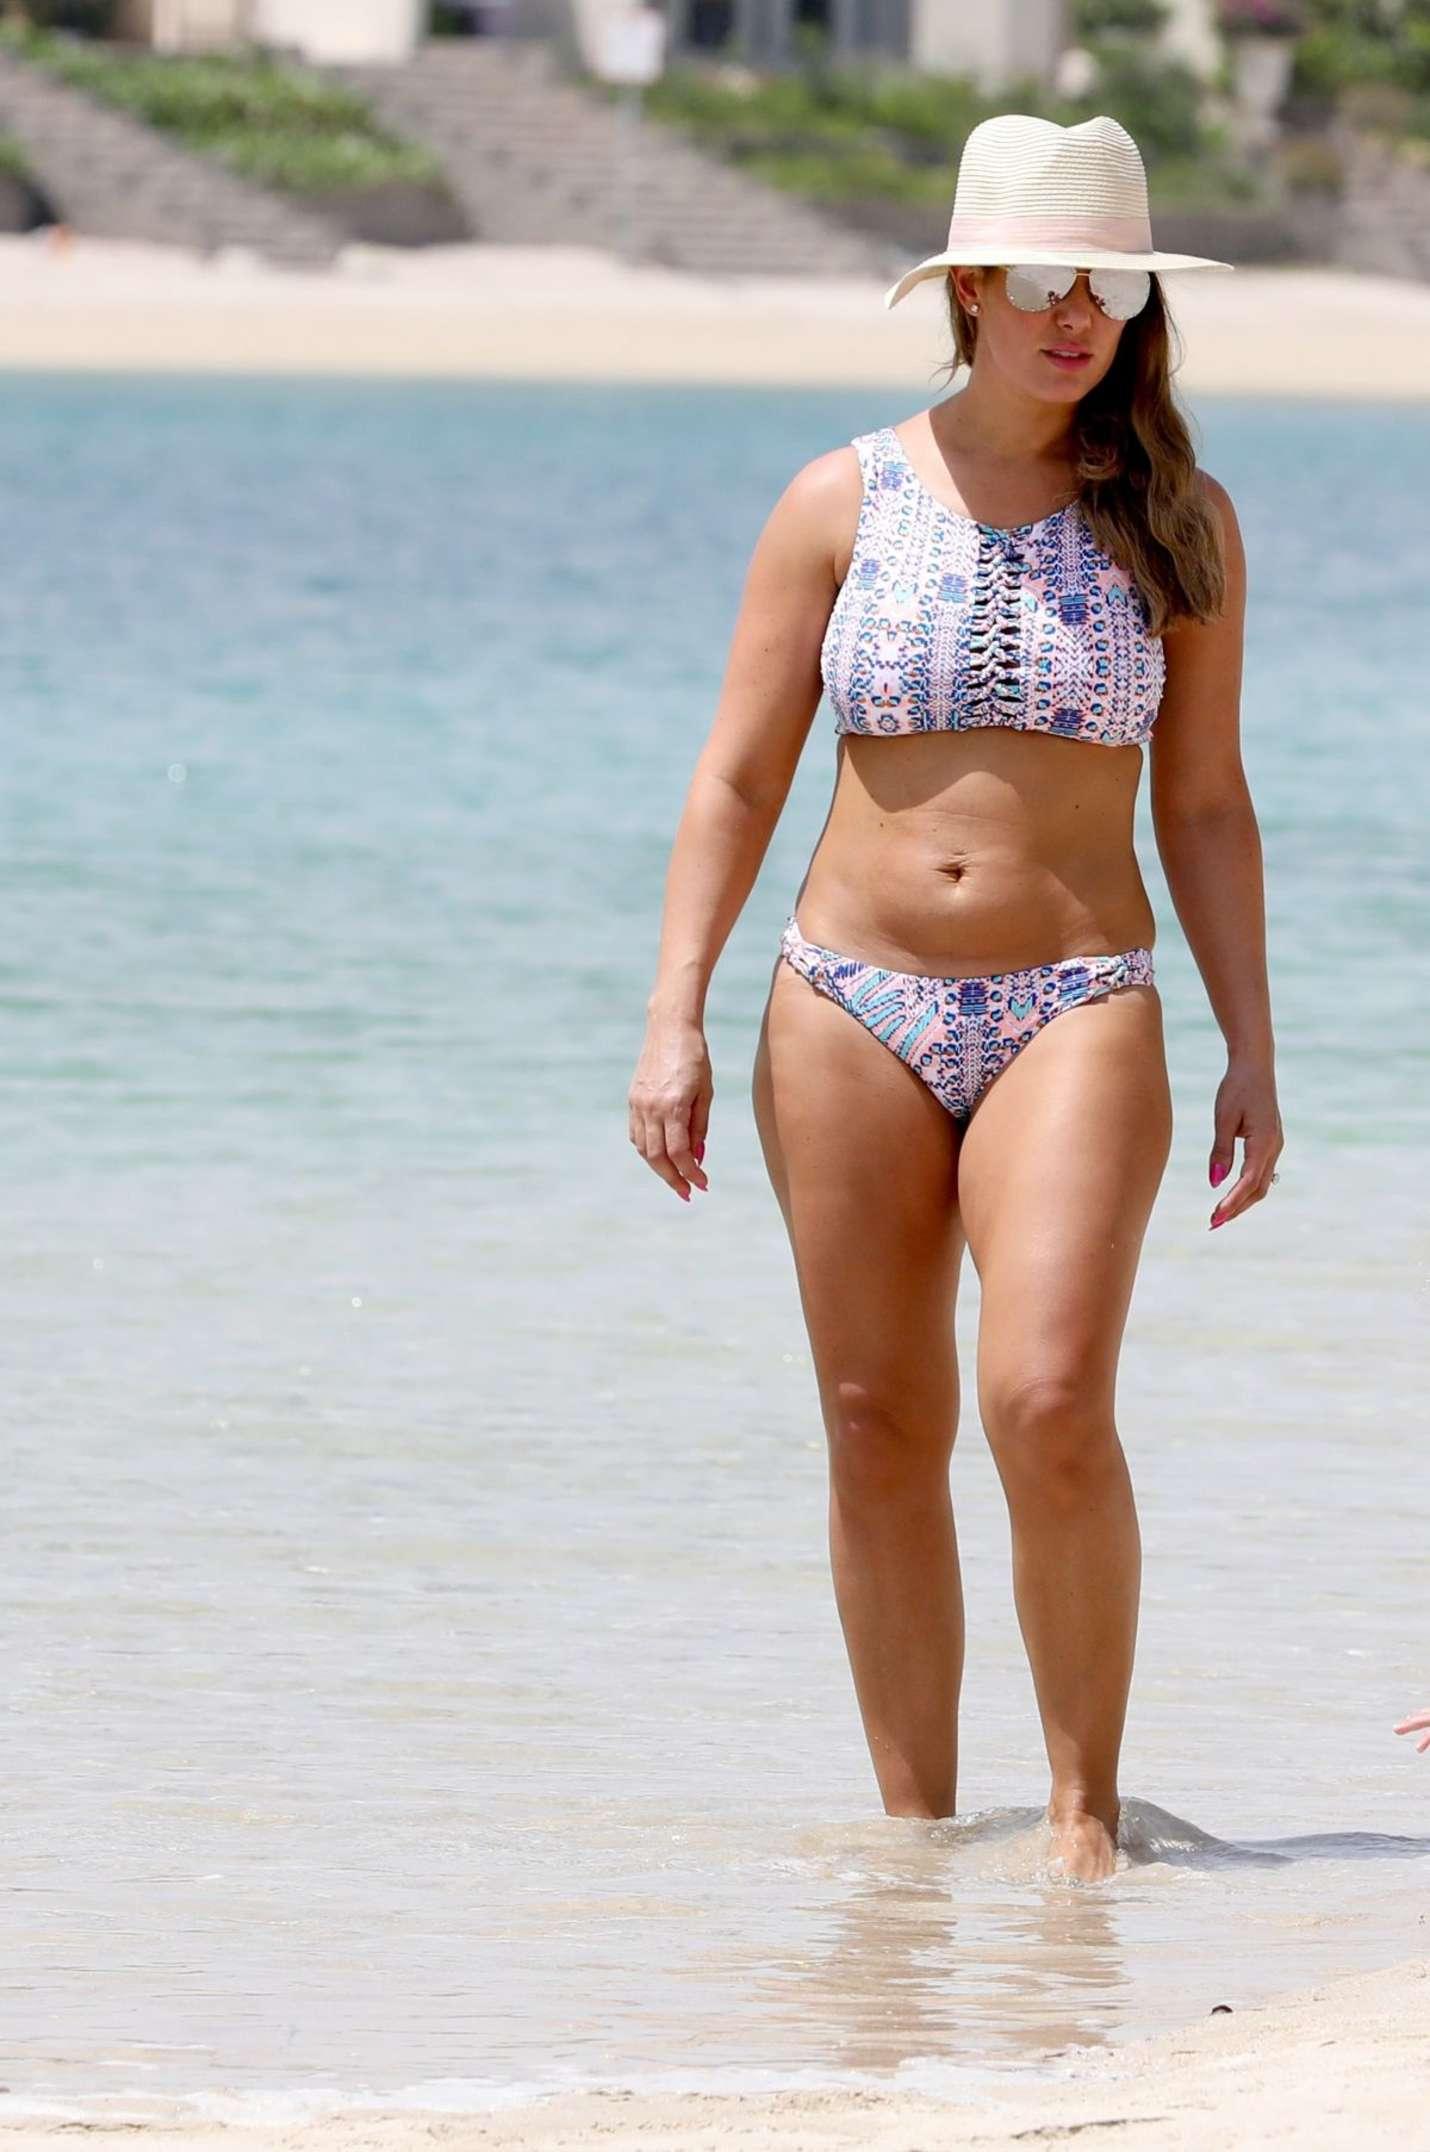 Bikini Rebekah Vardy nudes (91 foto and video), Topless, Bikini, Instagram, legs 2020